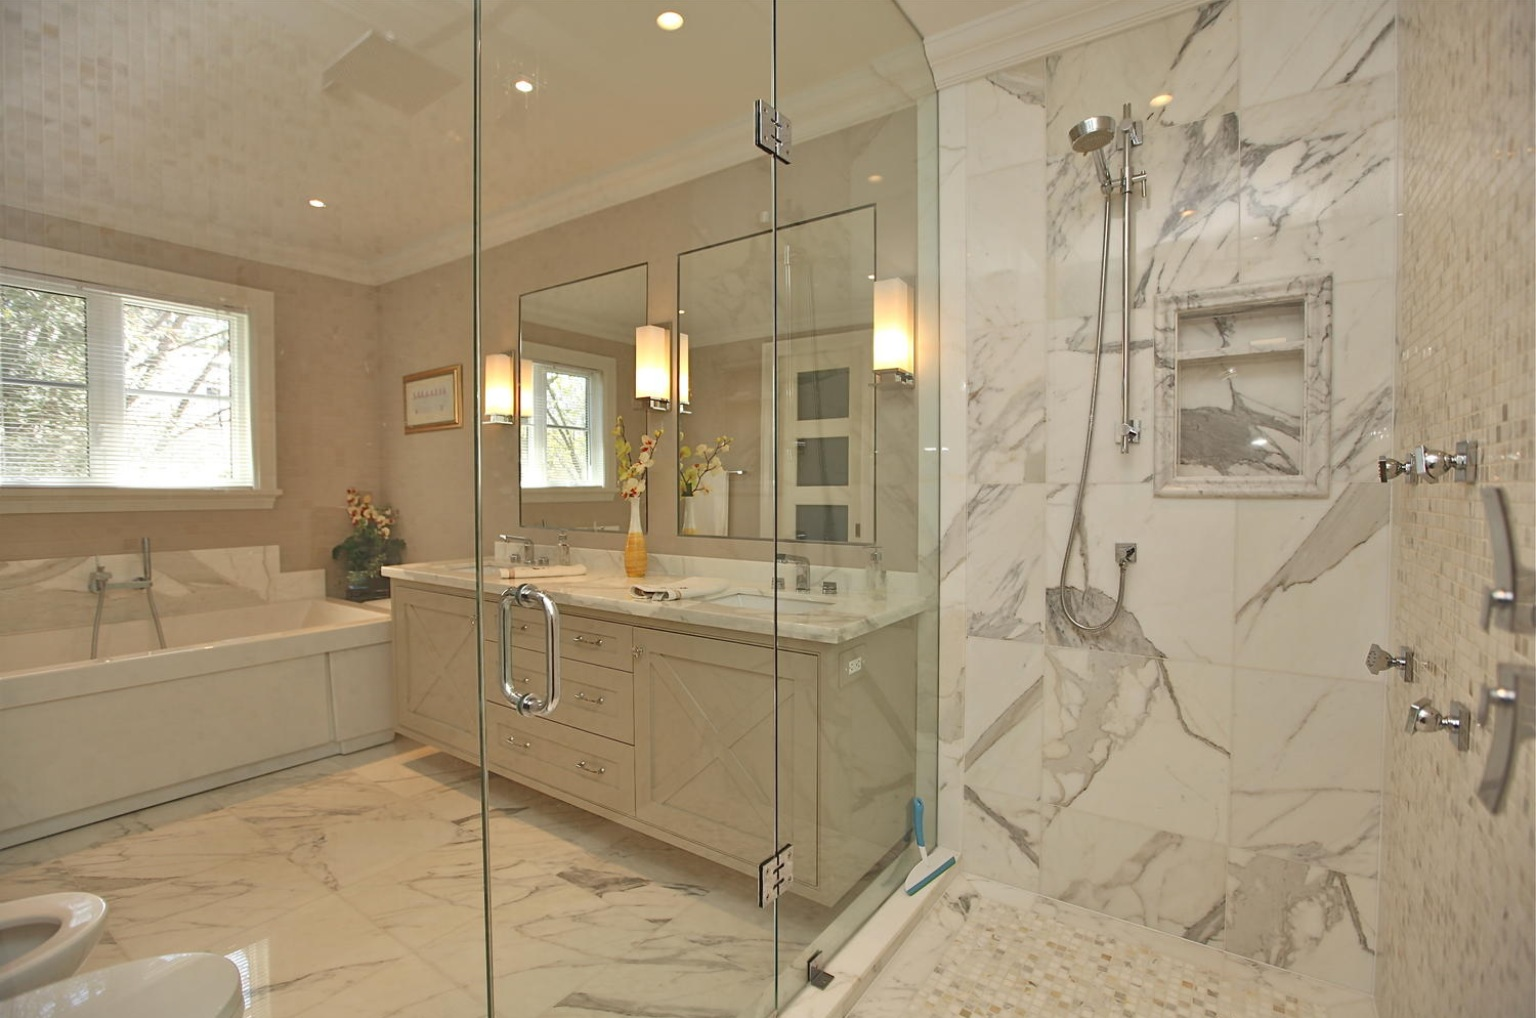 Bathroom Renovations and Remodeling | Toronto